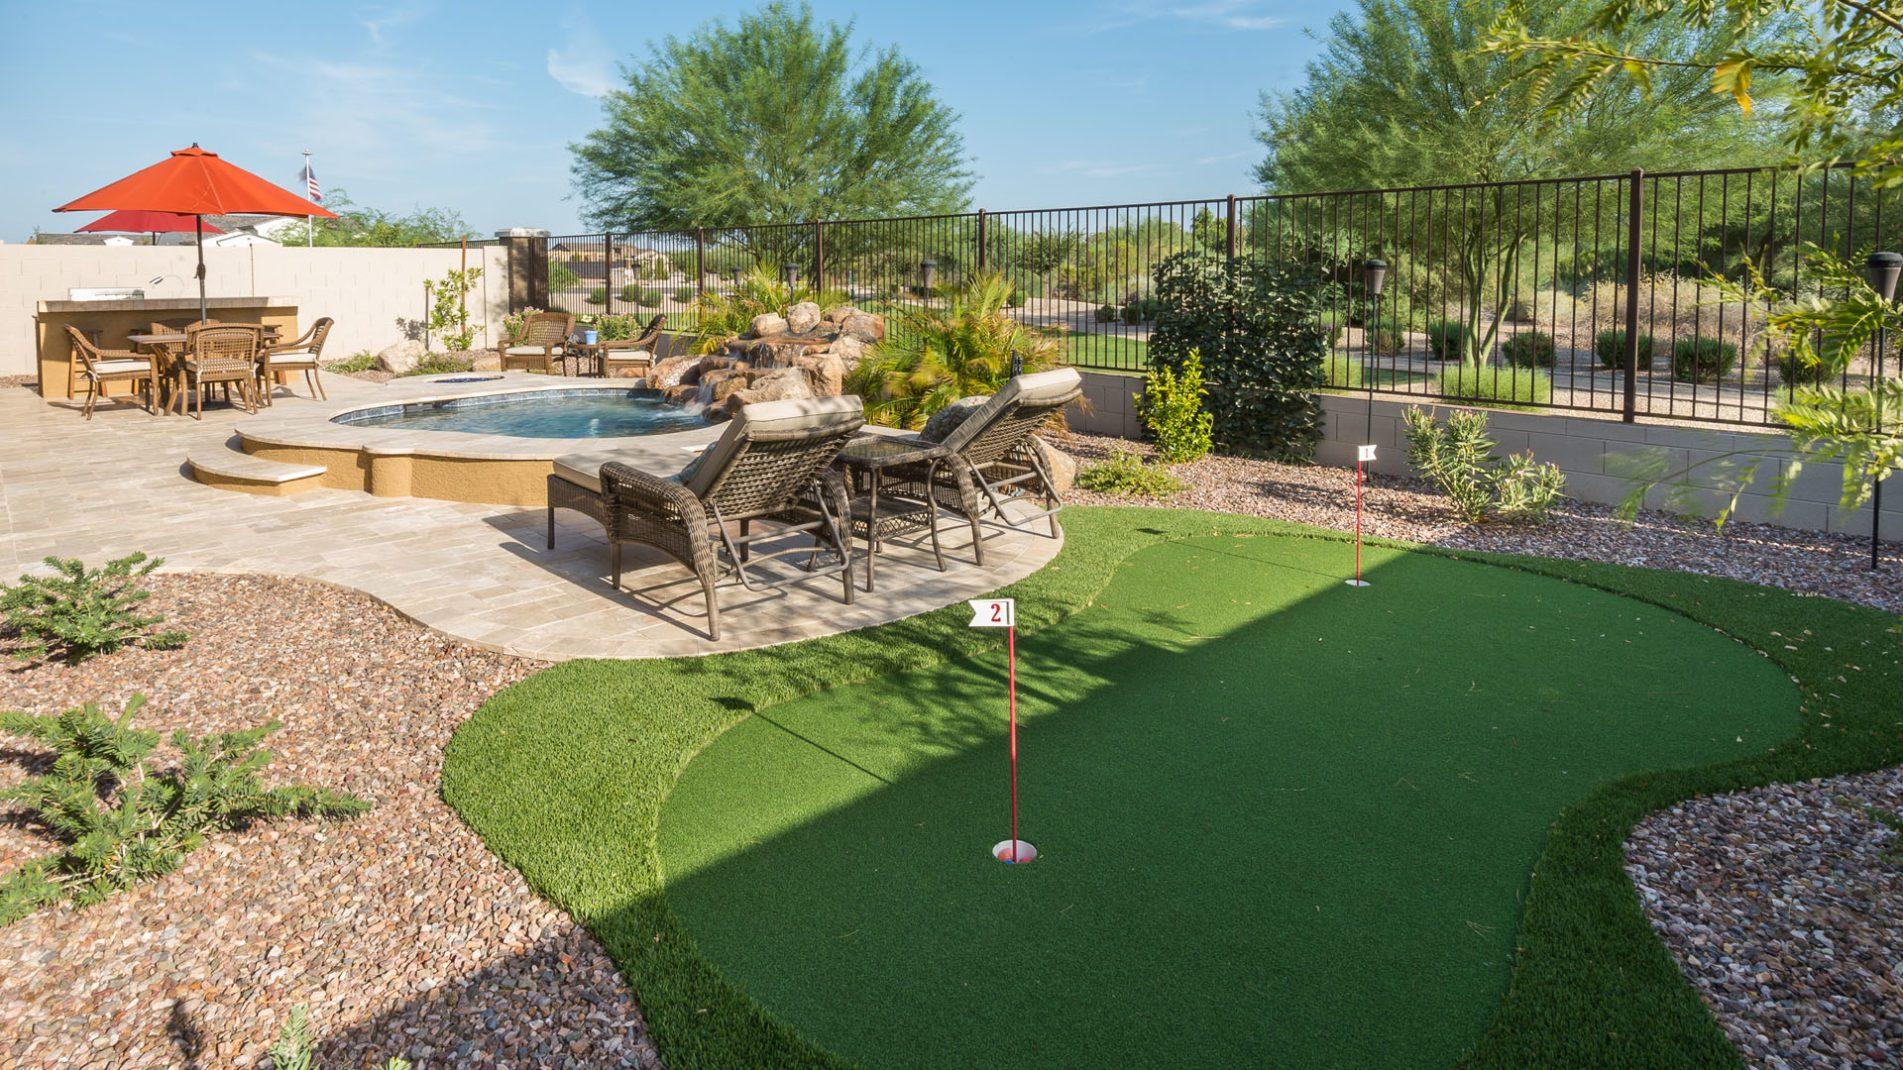 Small Backyard Pool Design Ideas: Queen Creek Ace Putting Green